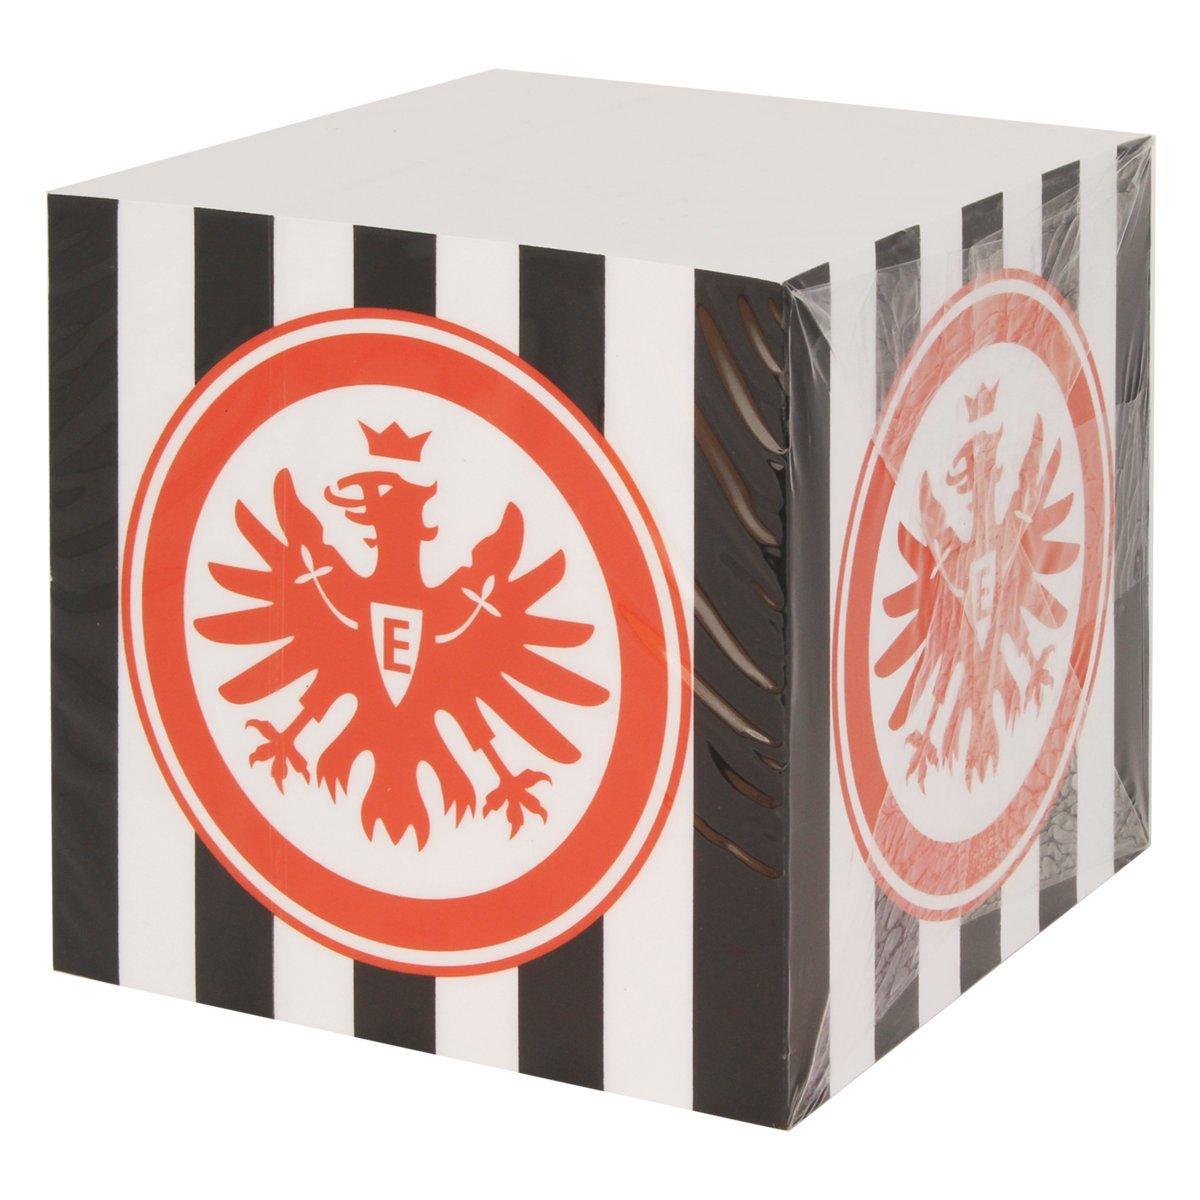 Eintracht Frankfurt Notizbuch ca 17x21x2 cm